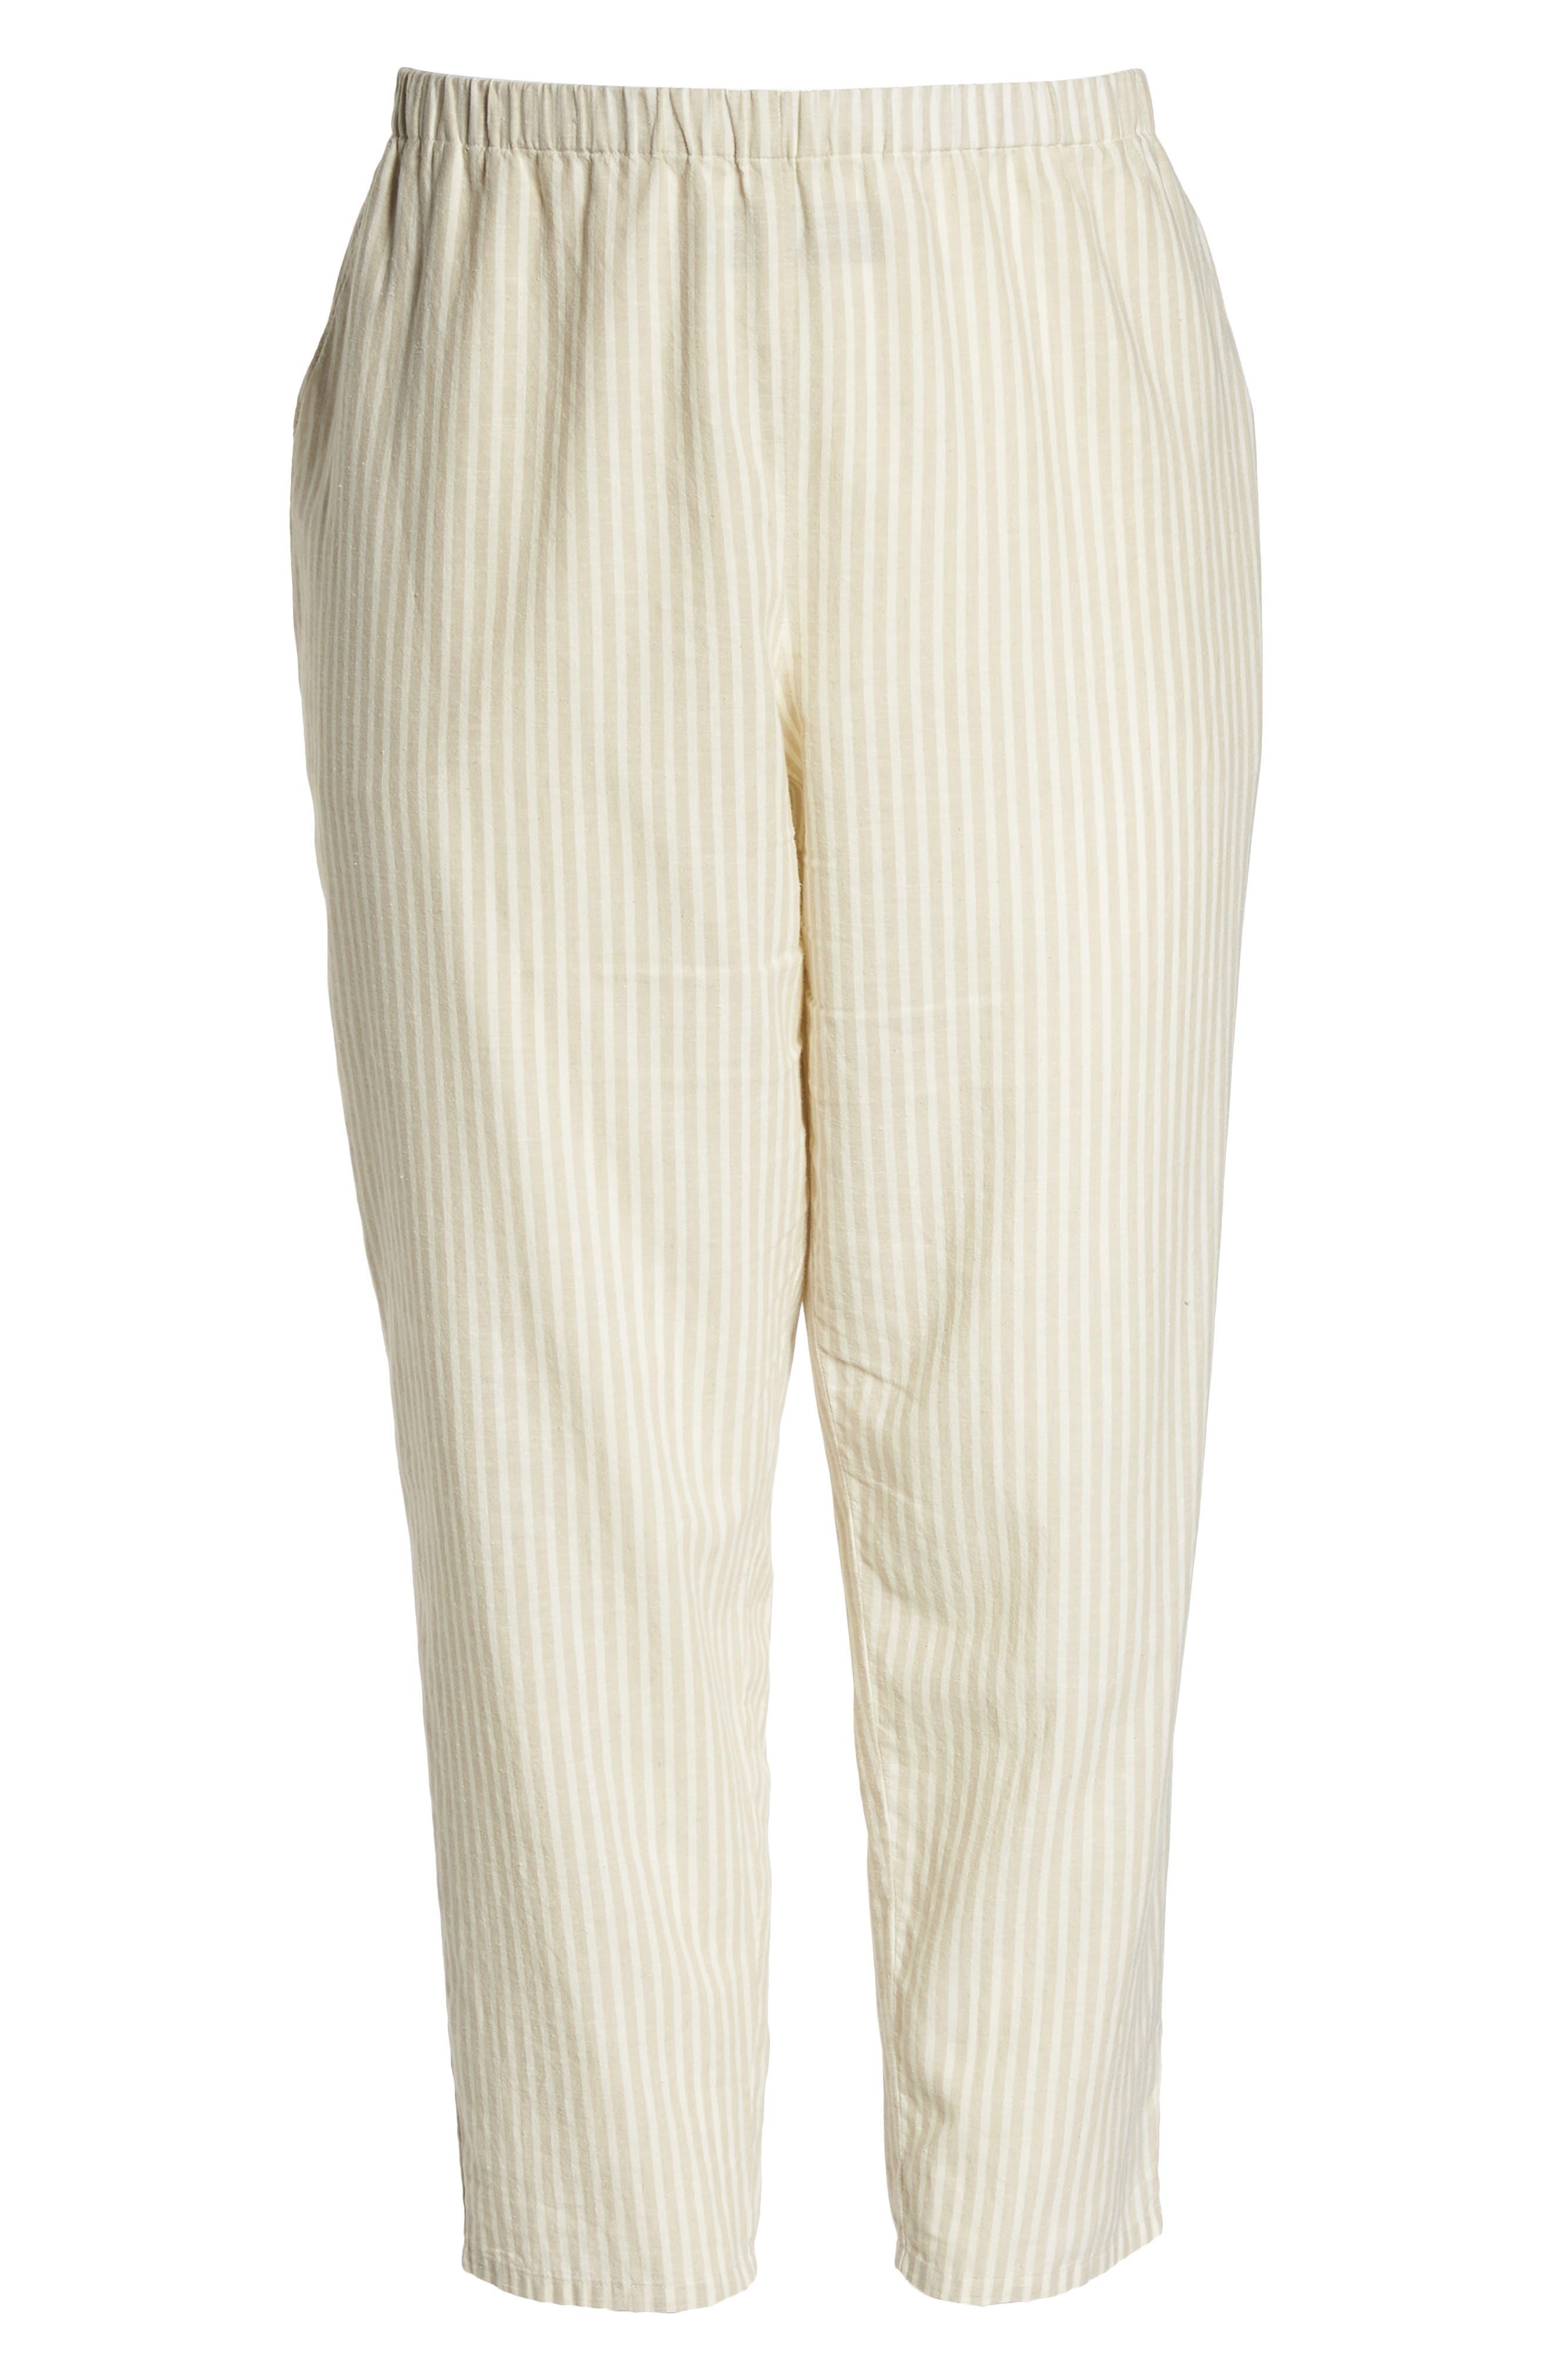 Stripe Ankle Hemp & Cotton Pants,                             Alternate thumbnail 7, color,                             Natural